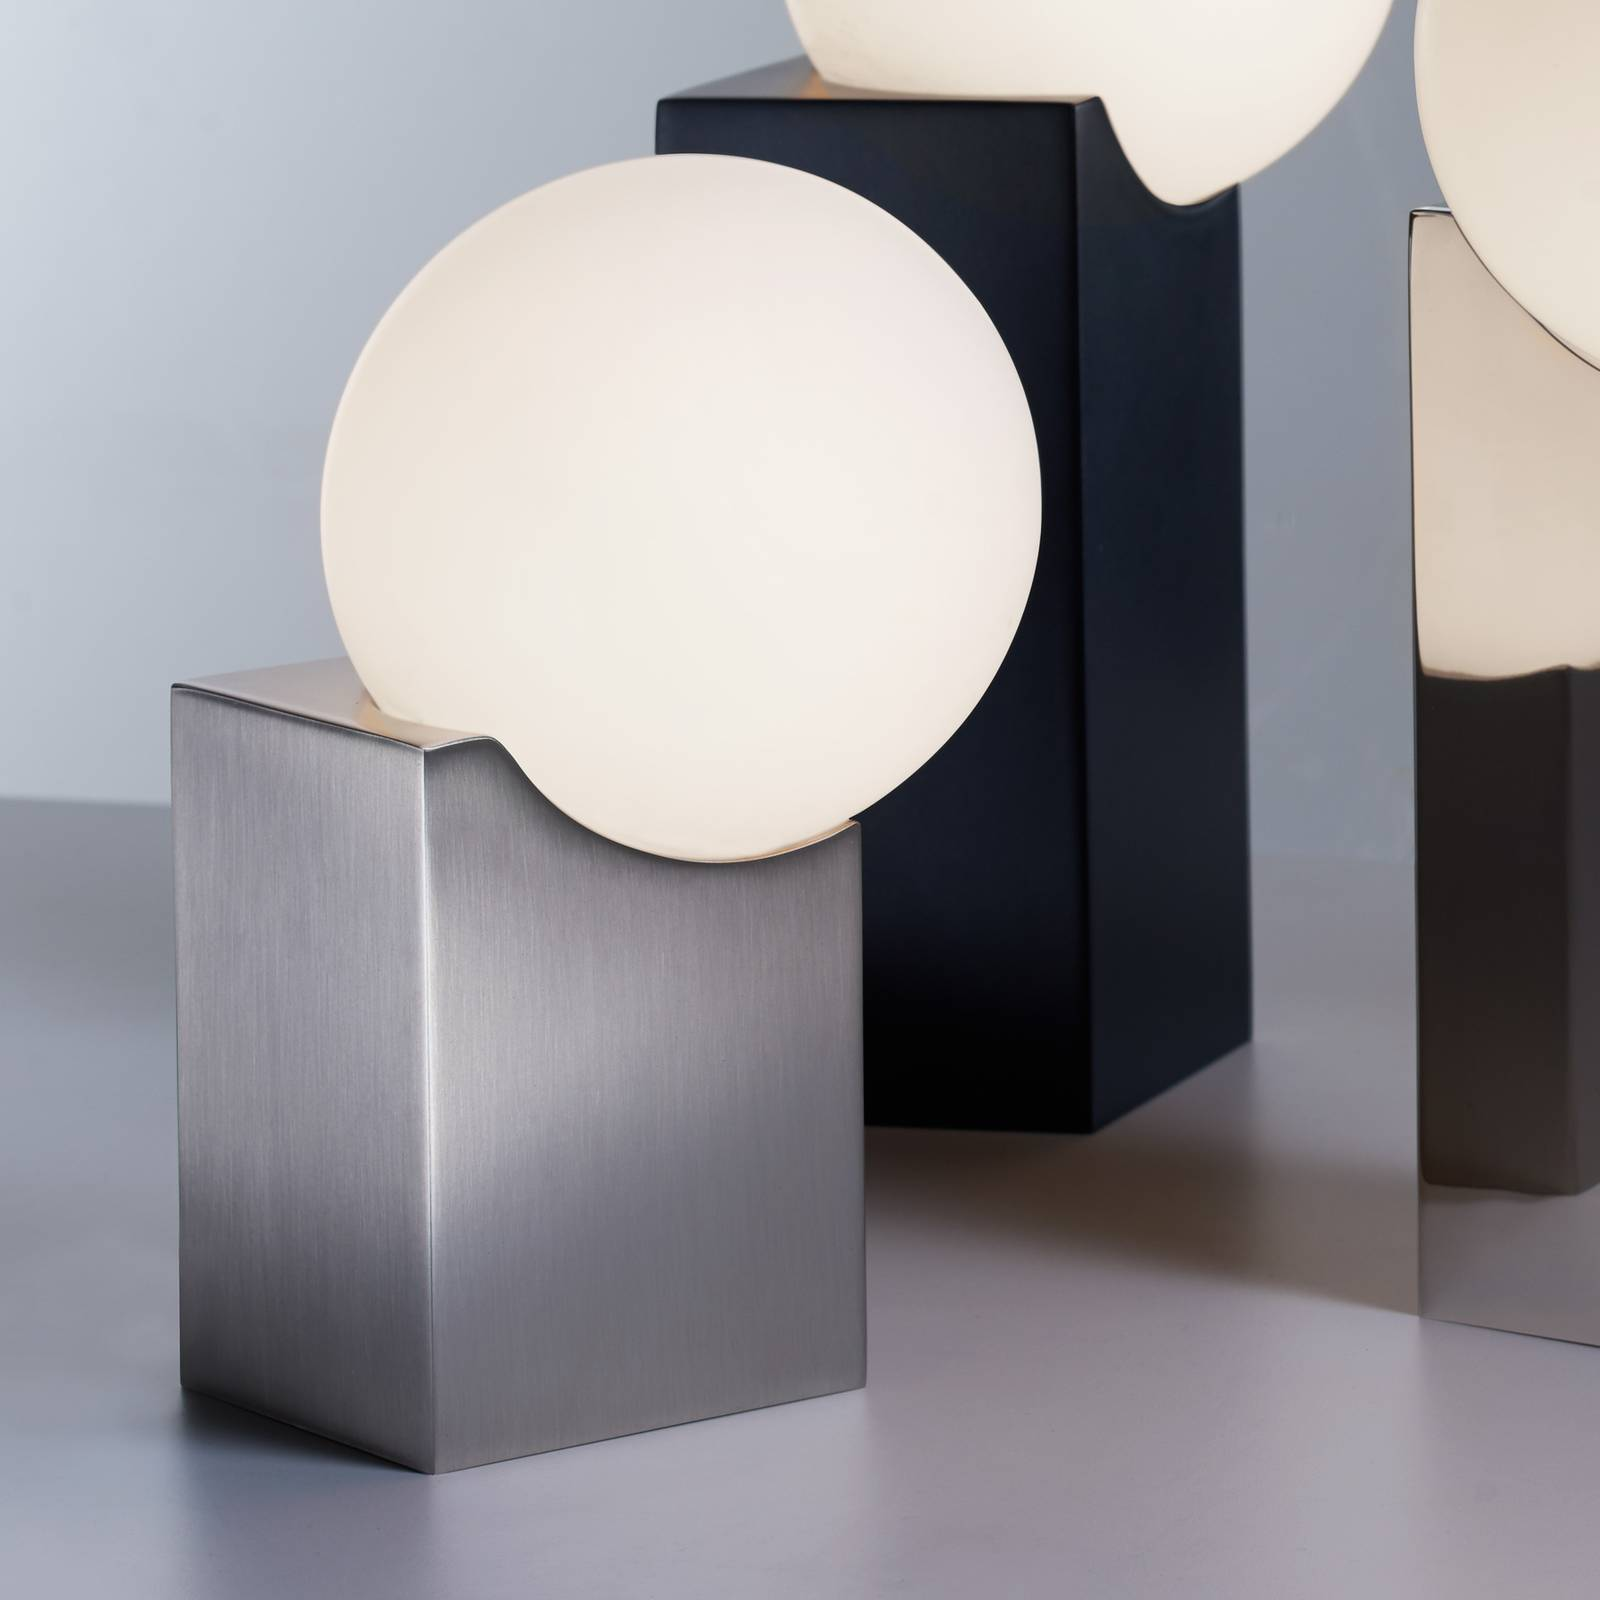 Pöytälamppu Cub 23,5 cm, matta nikkeli